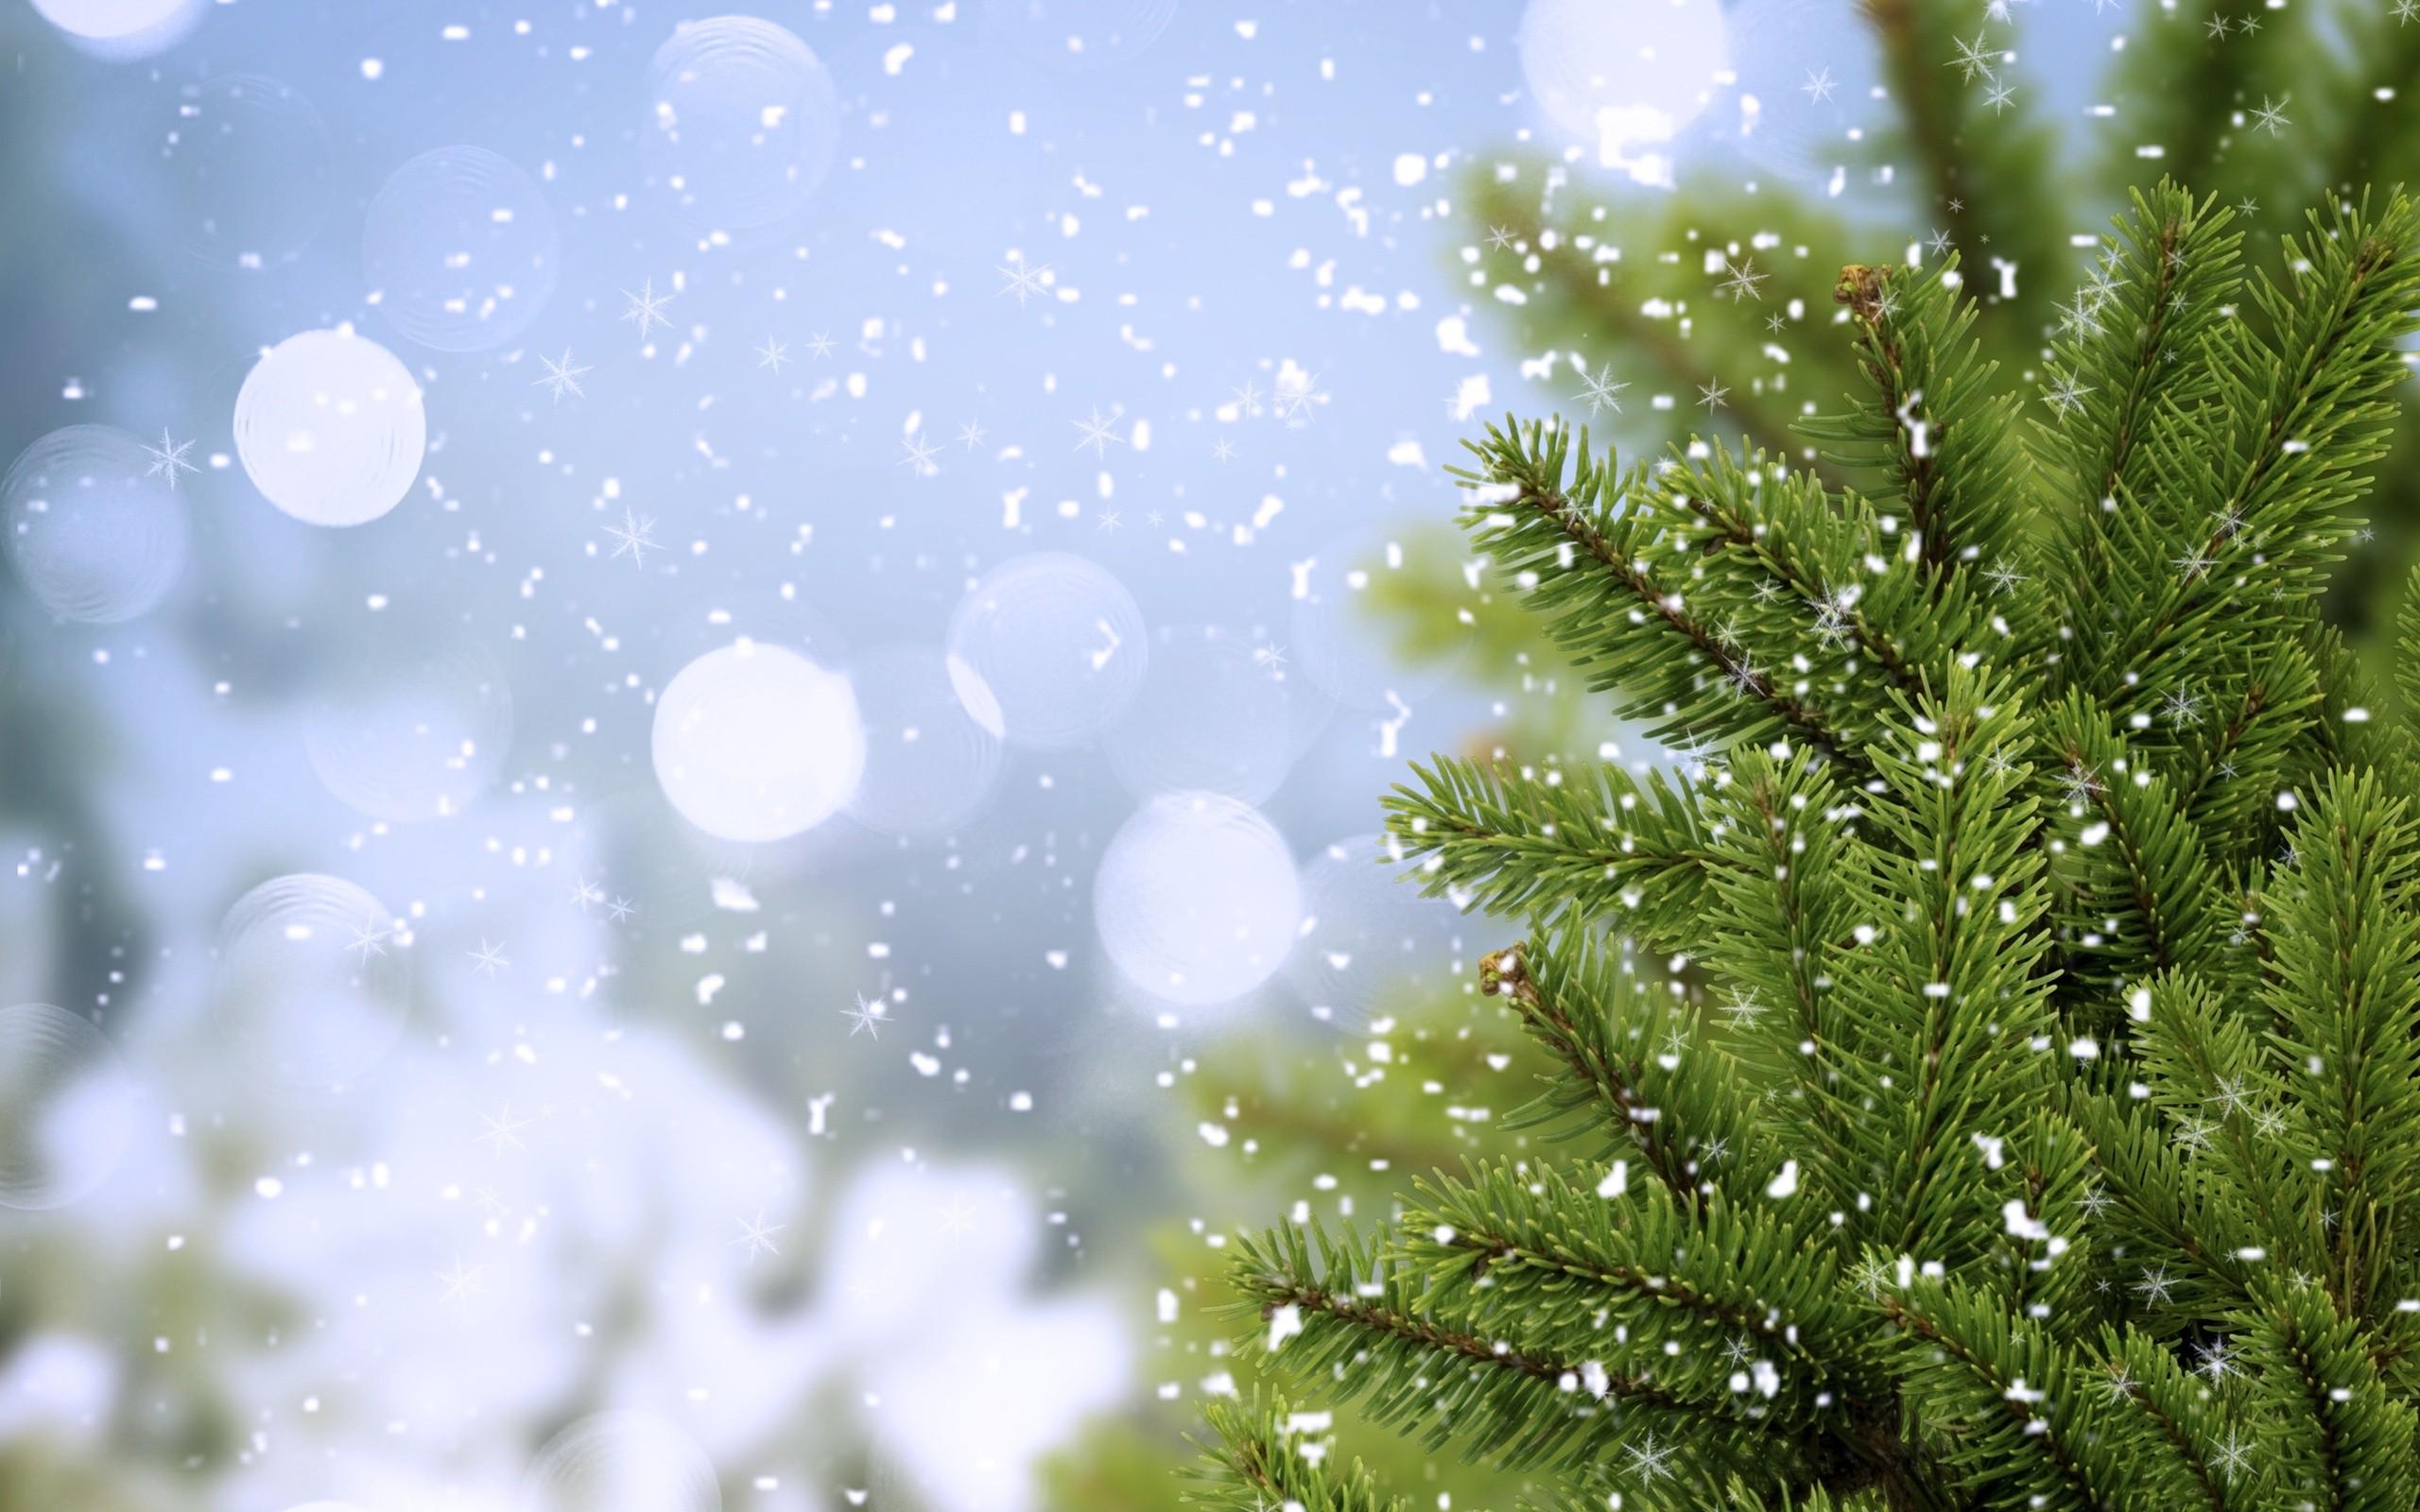 Christmas Pine Trees